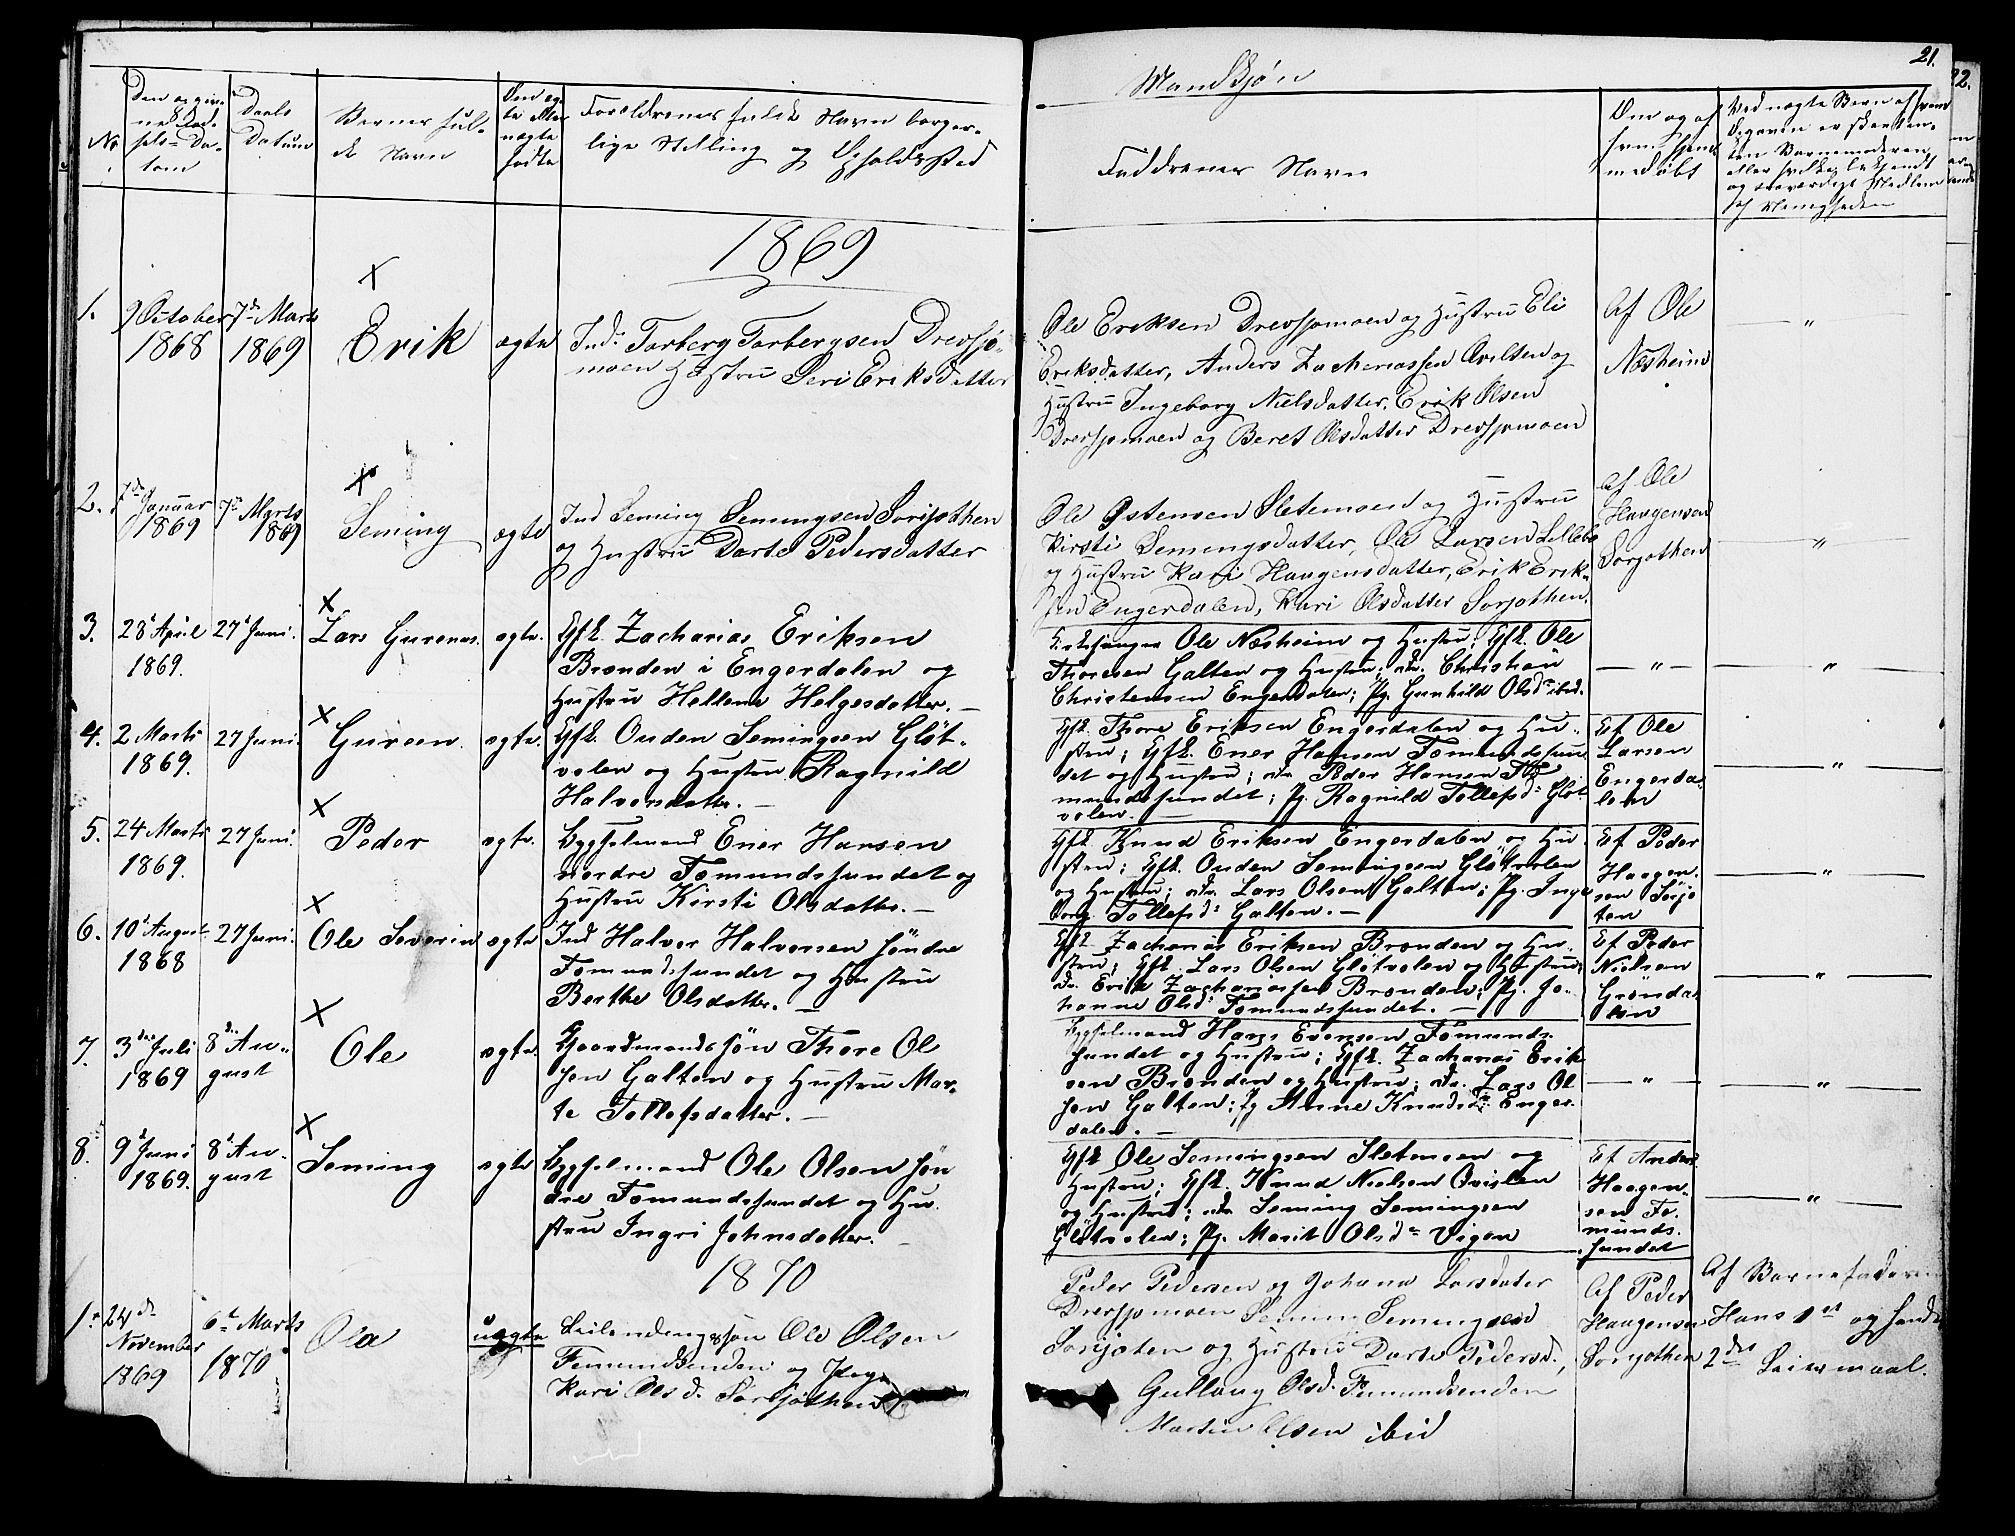 SAH, Rendalen prestekontor, H/Ha/Hab/L0002: Parish register (copy) no. 2, 1858-1880, p. 21